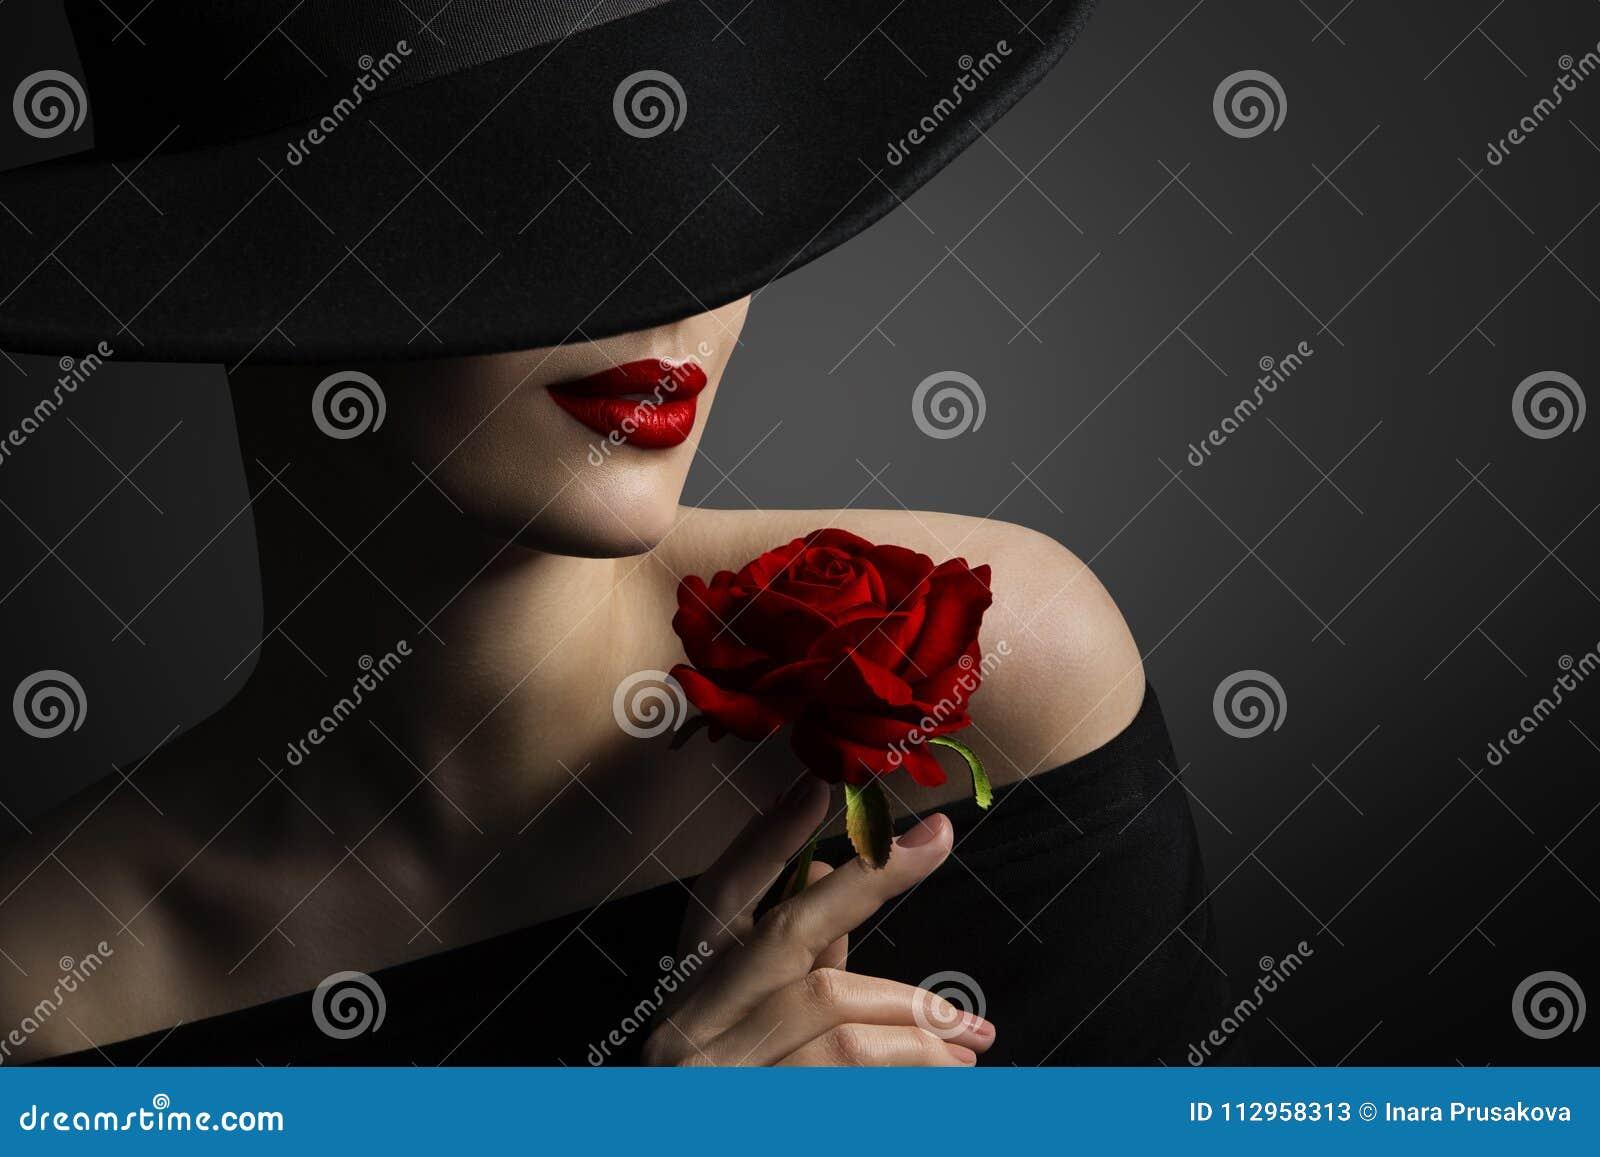 Labios y Rose Flower rojos, modelo de moda Beauty Portrait de la mujer